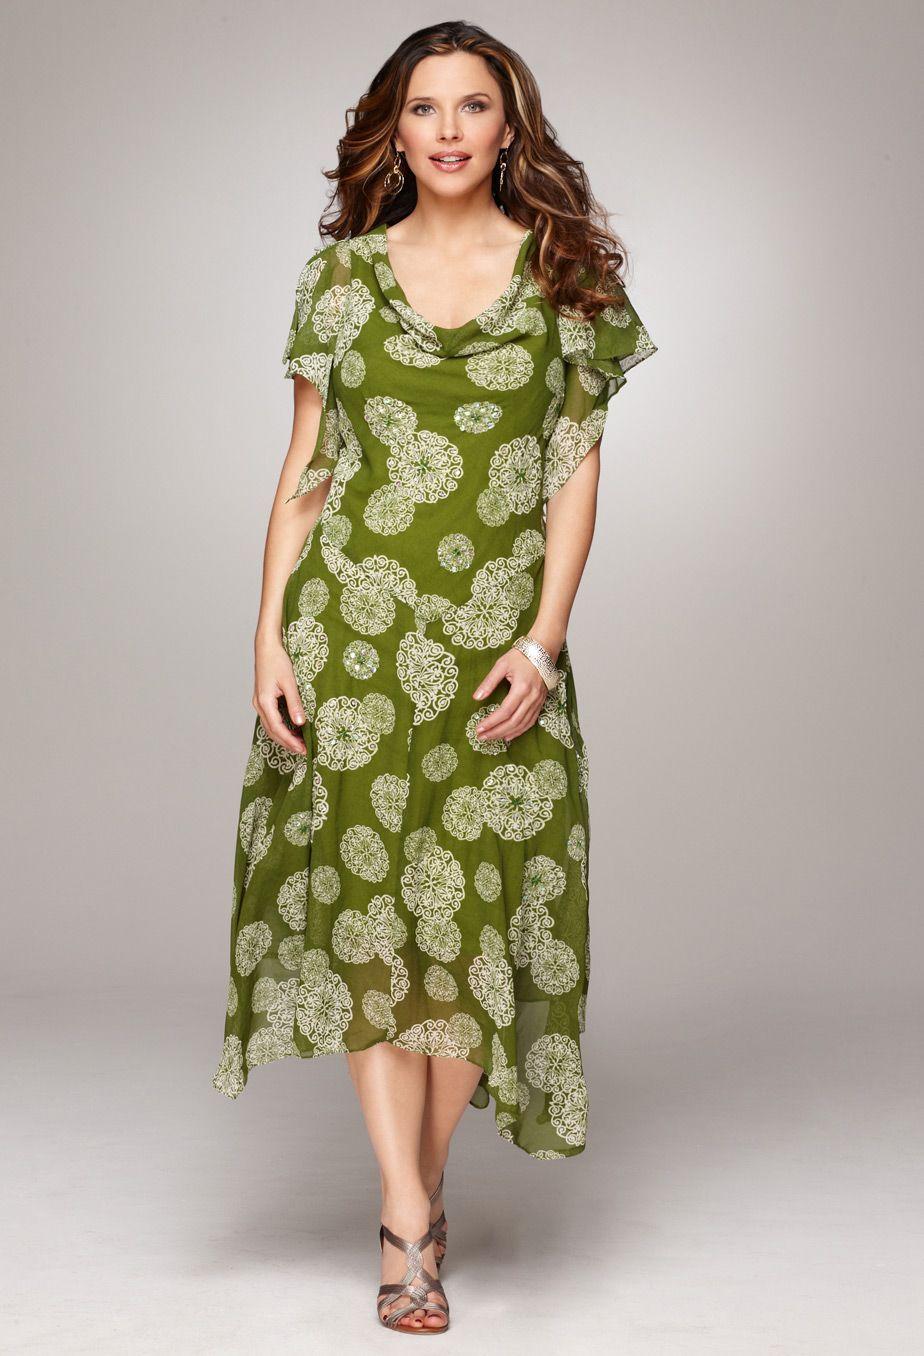 Plus Size Georgette Print Dress | Plus Size Dresses & Skirts ...